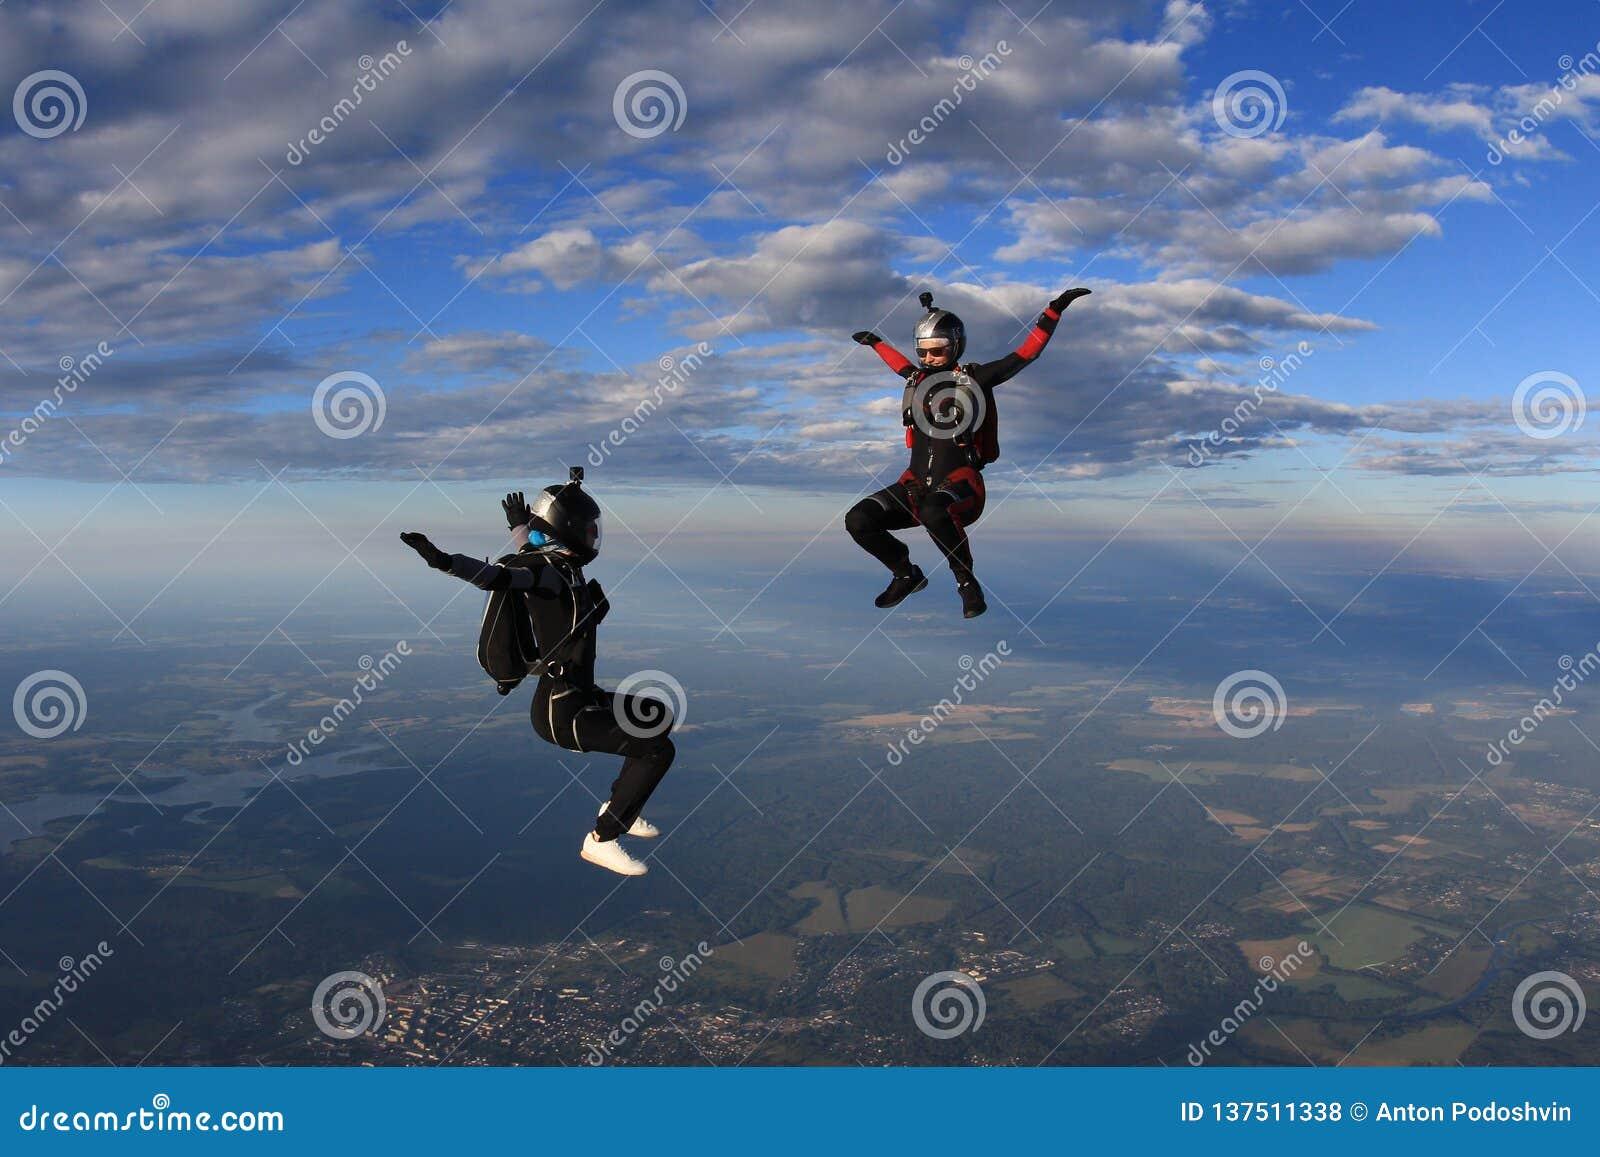 Skydiving 两个beatuful女孩在天空飞行